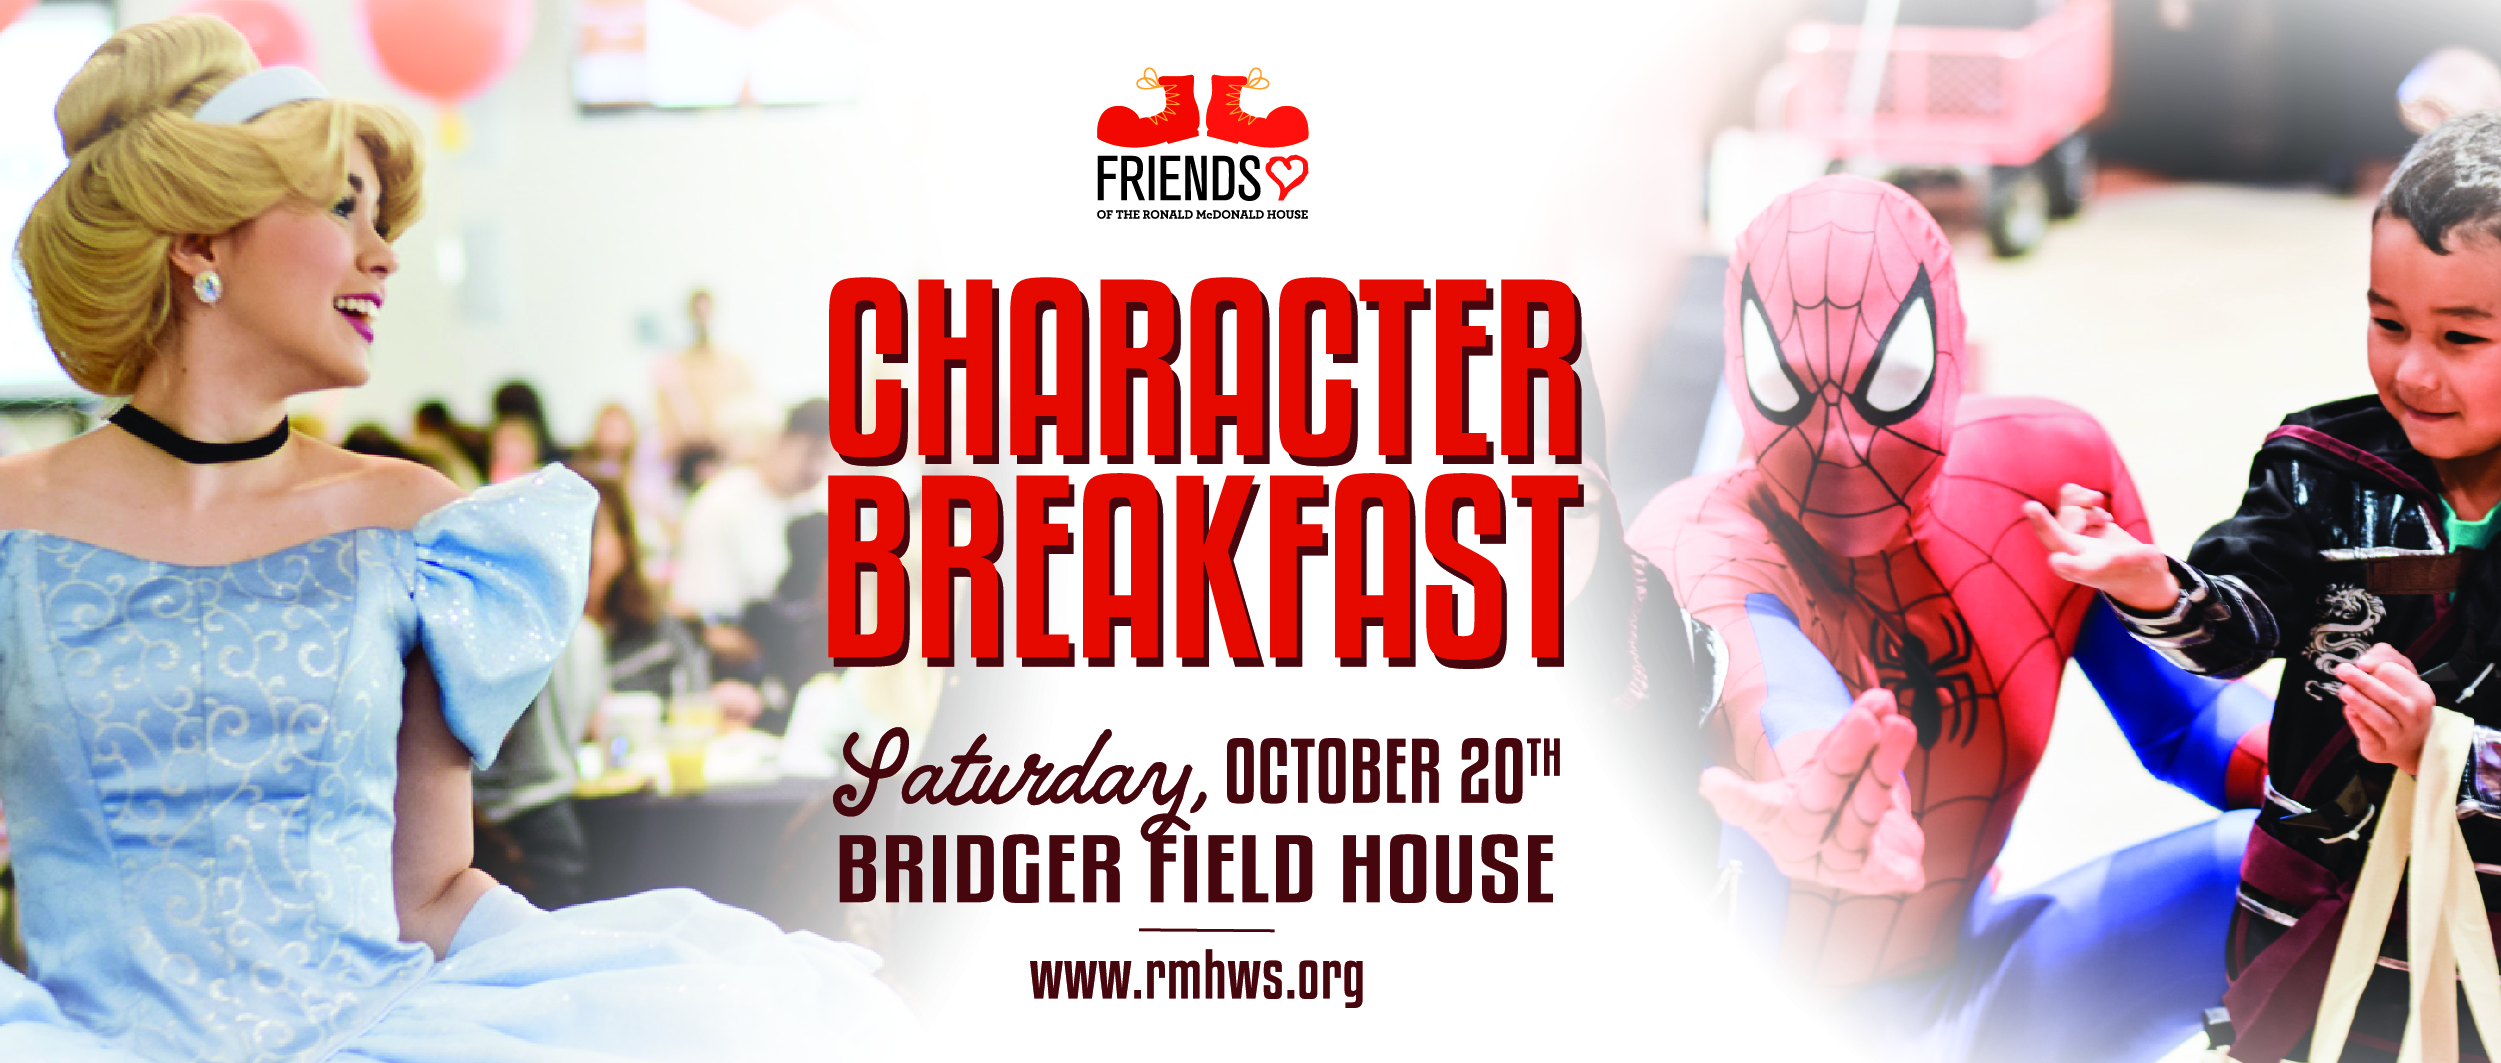 Ronald McDonald House Character Breakfast